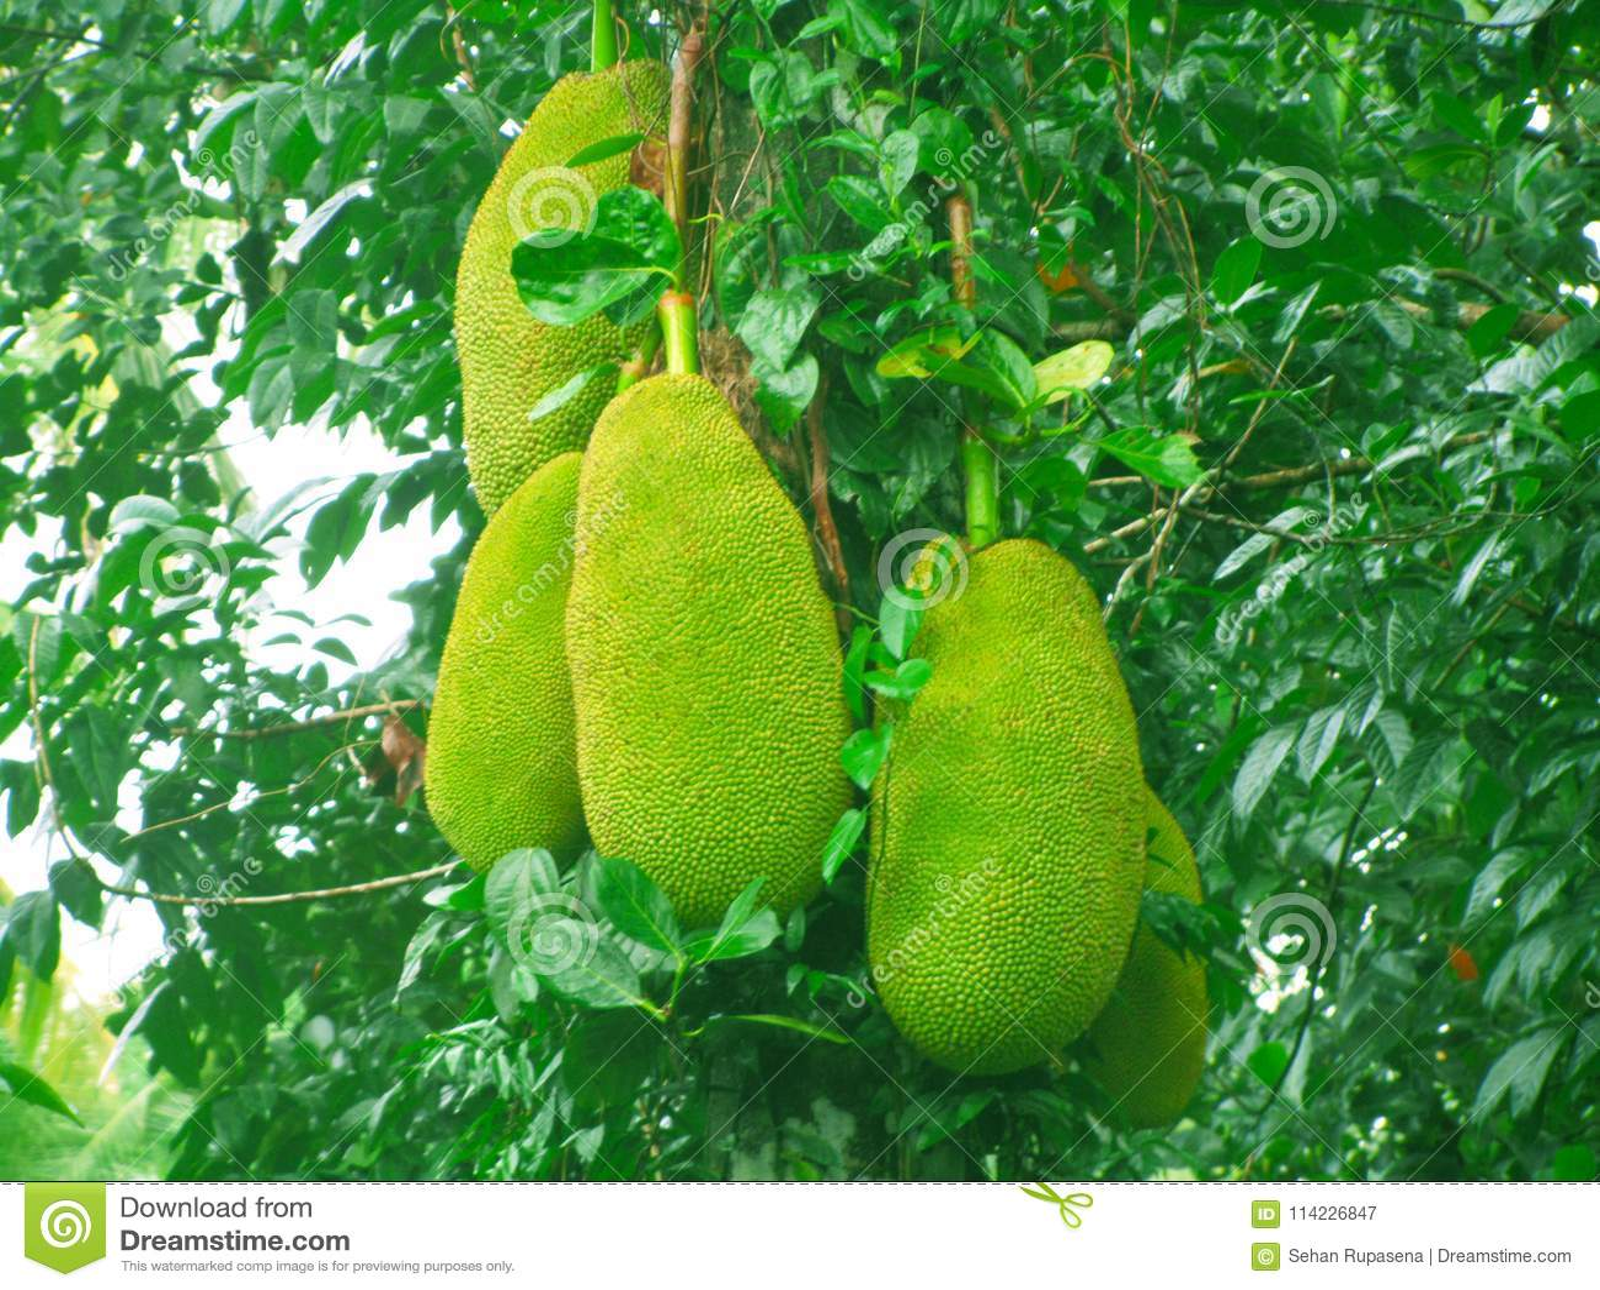 Sri Lankan Jack Country Food Fruit Vegetable Stock Image Image